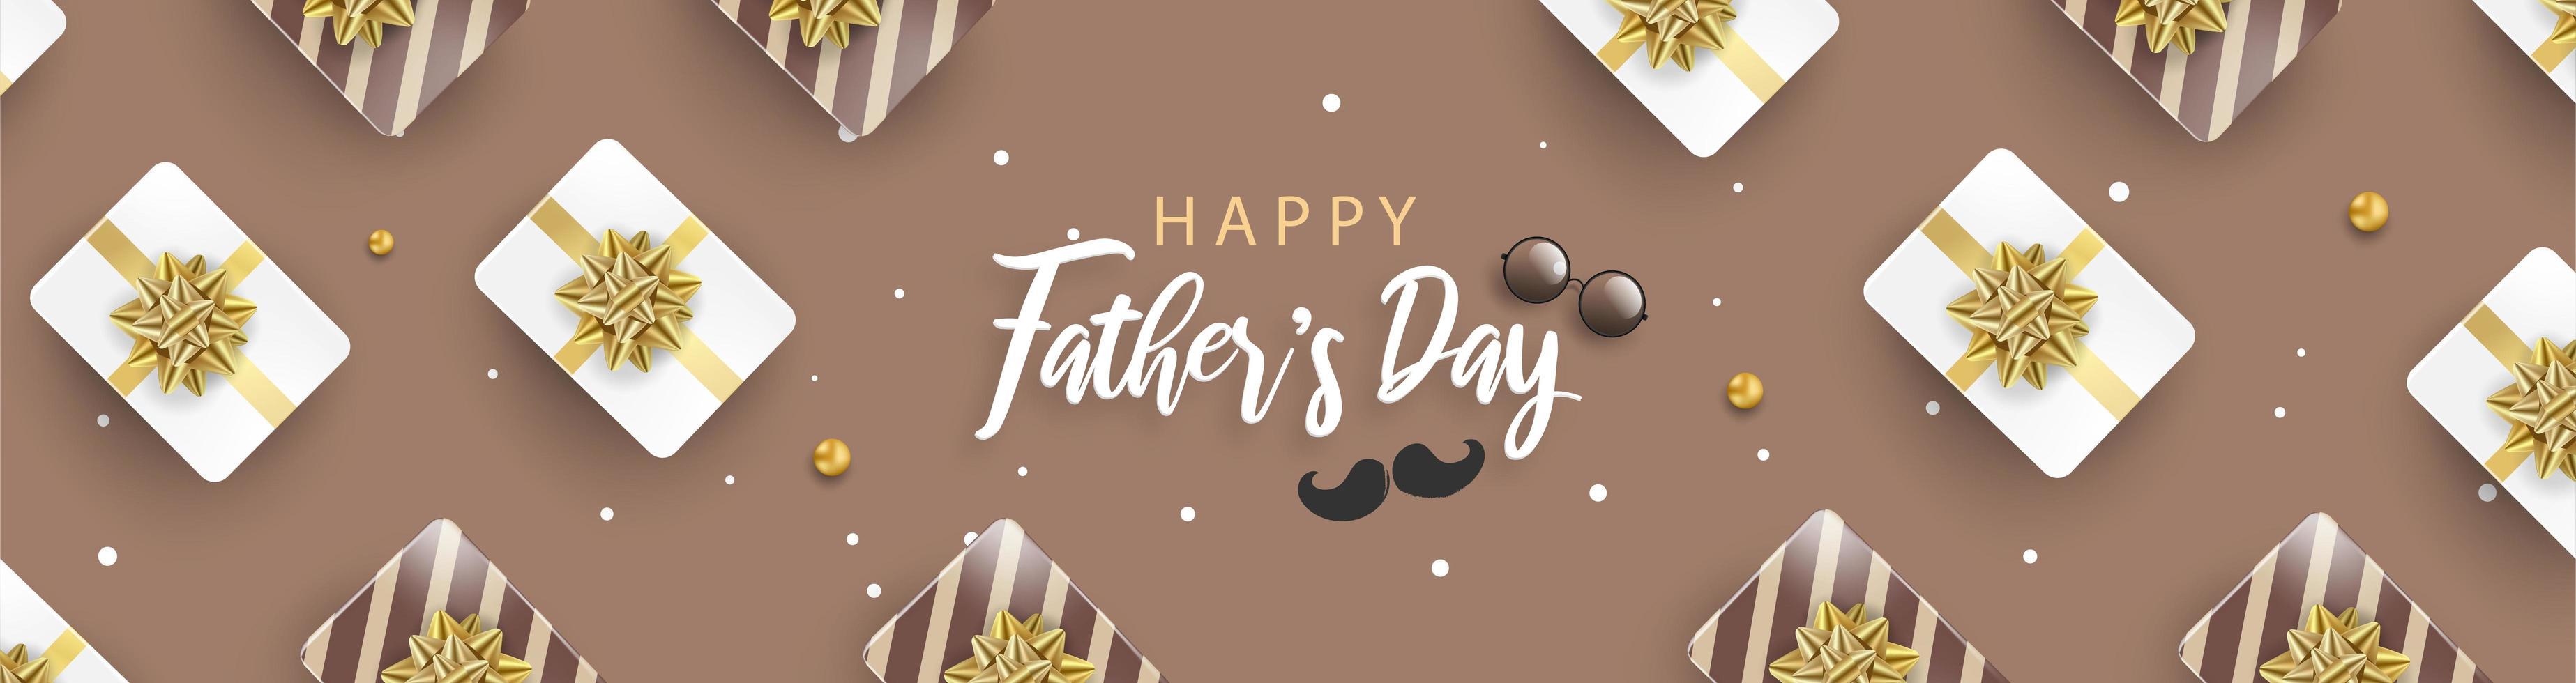 gelukkige vaderdag poster bruine banner vector